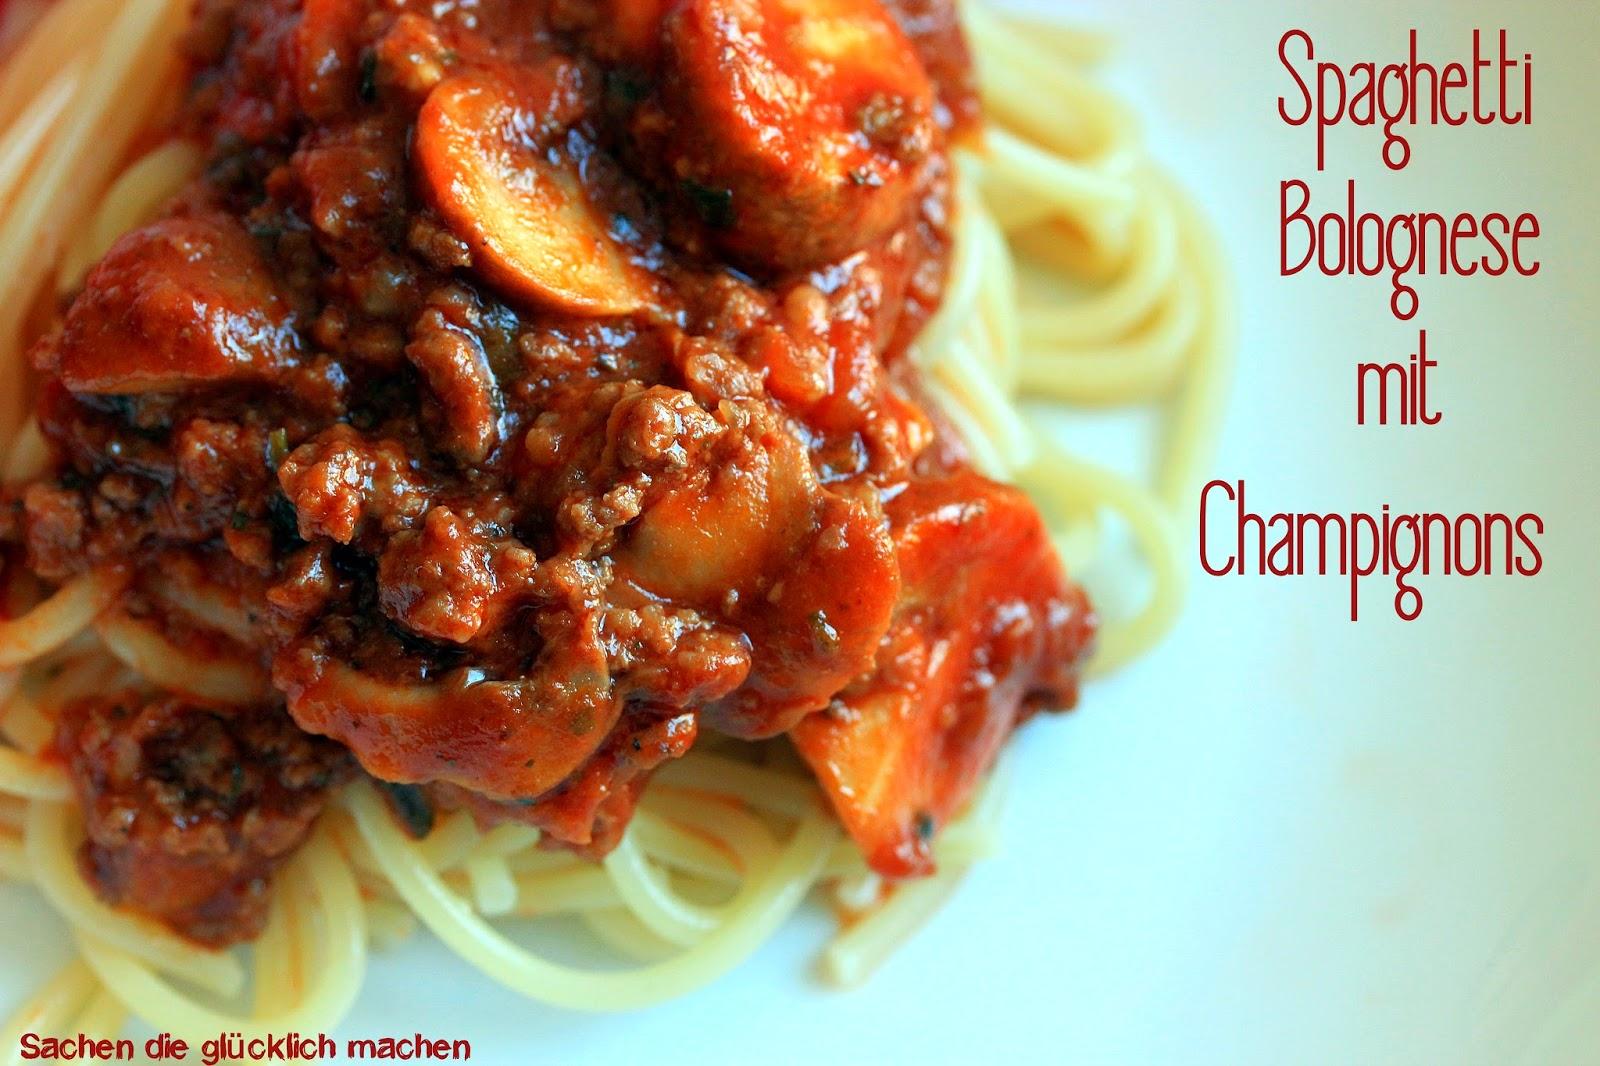 sachen die gl cklich machen spaghetti bolognese mit champignons. Black Bedroom Furniture Sets. Home Design Ideas